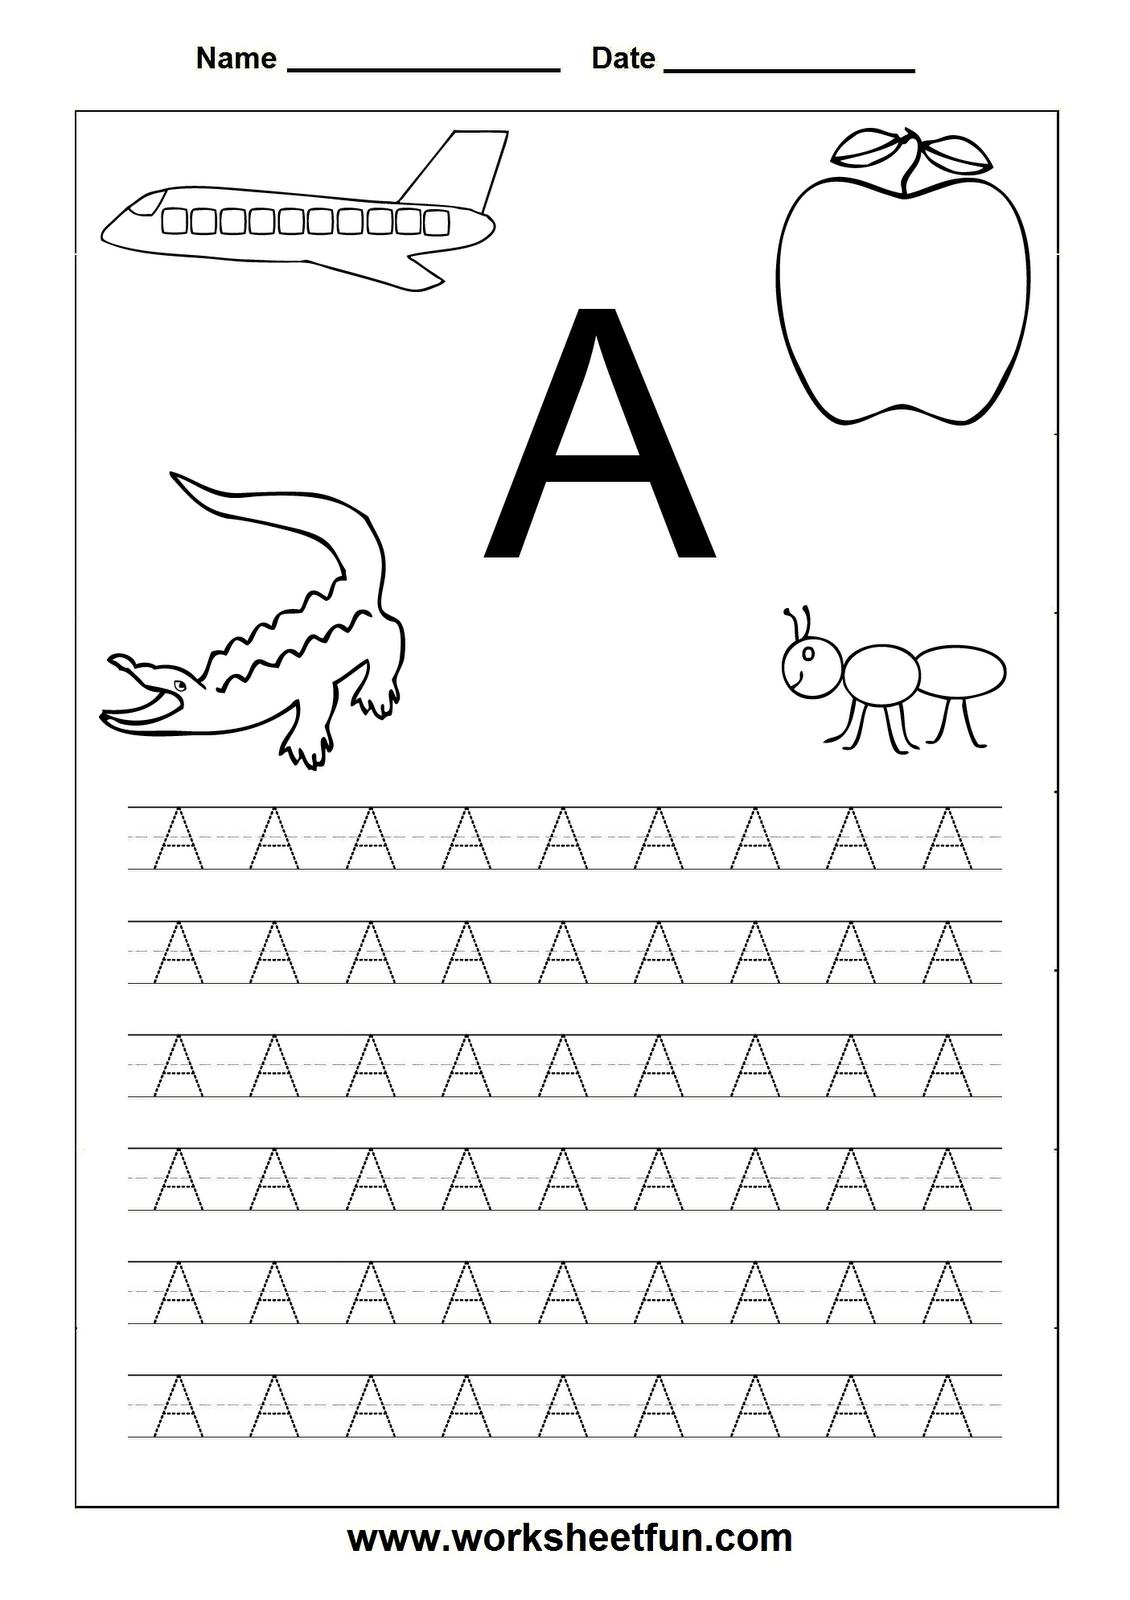 Abc Printable Worksheets For Kindergarten – Mreichert Kids Worksheets